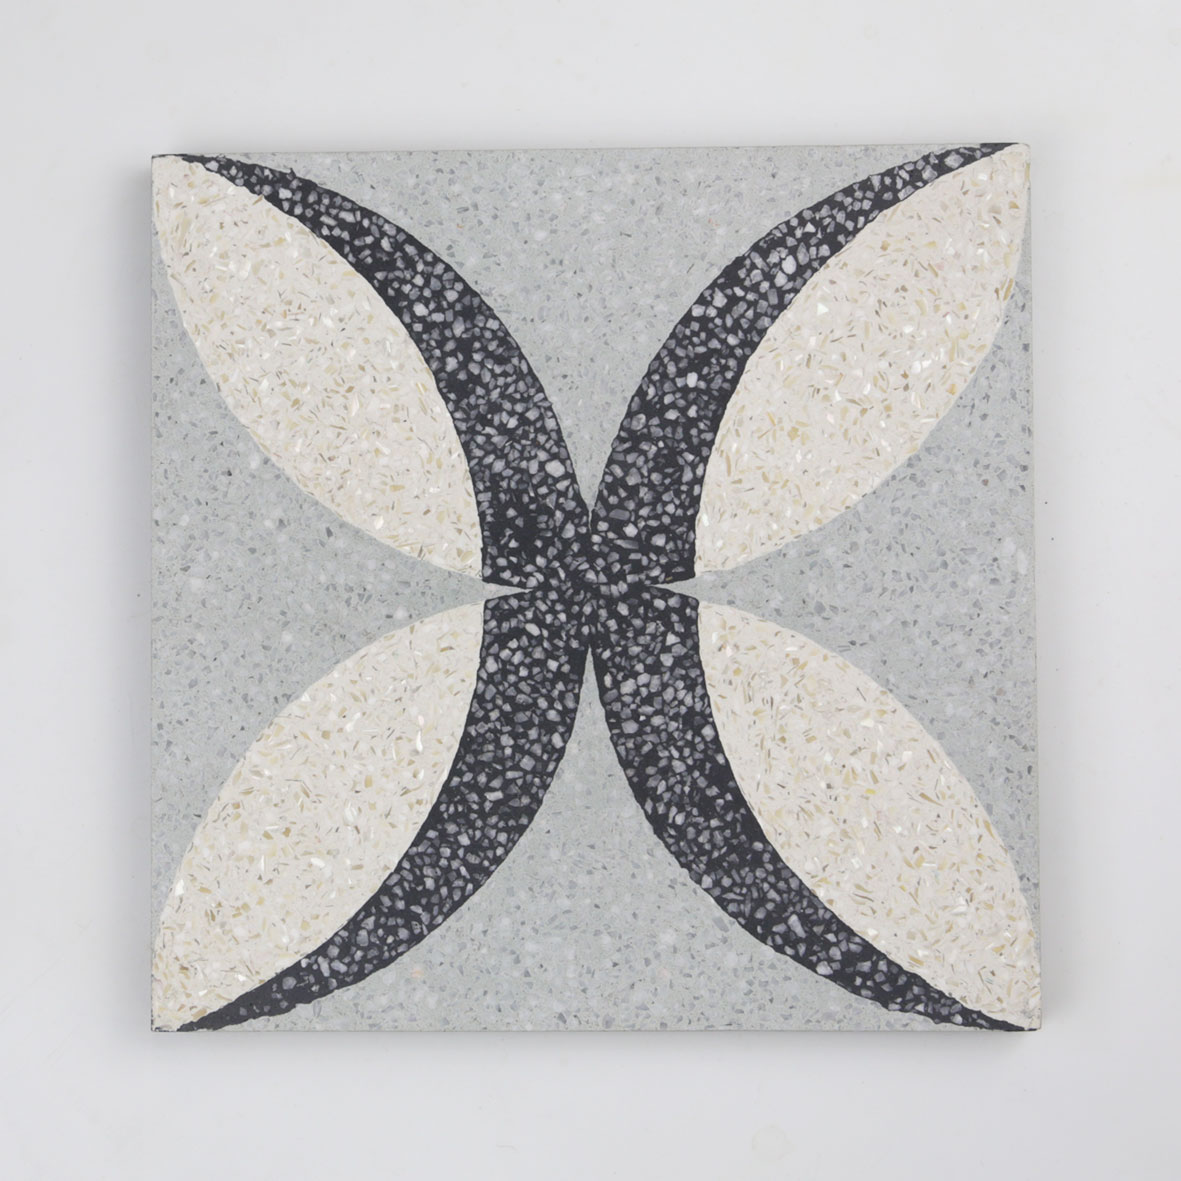 VT20-371 Butterfly (XC)